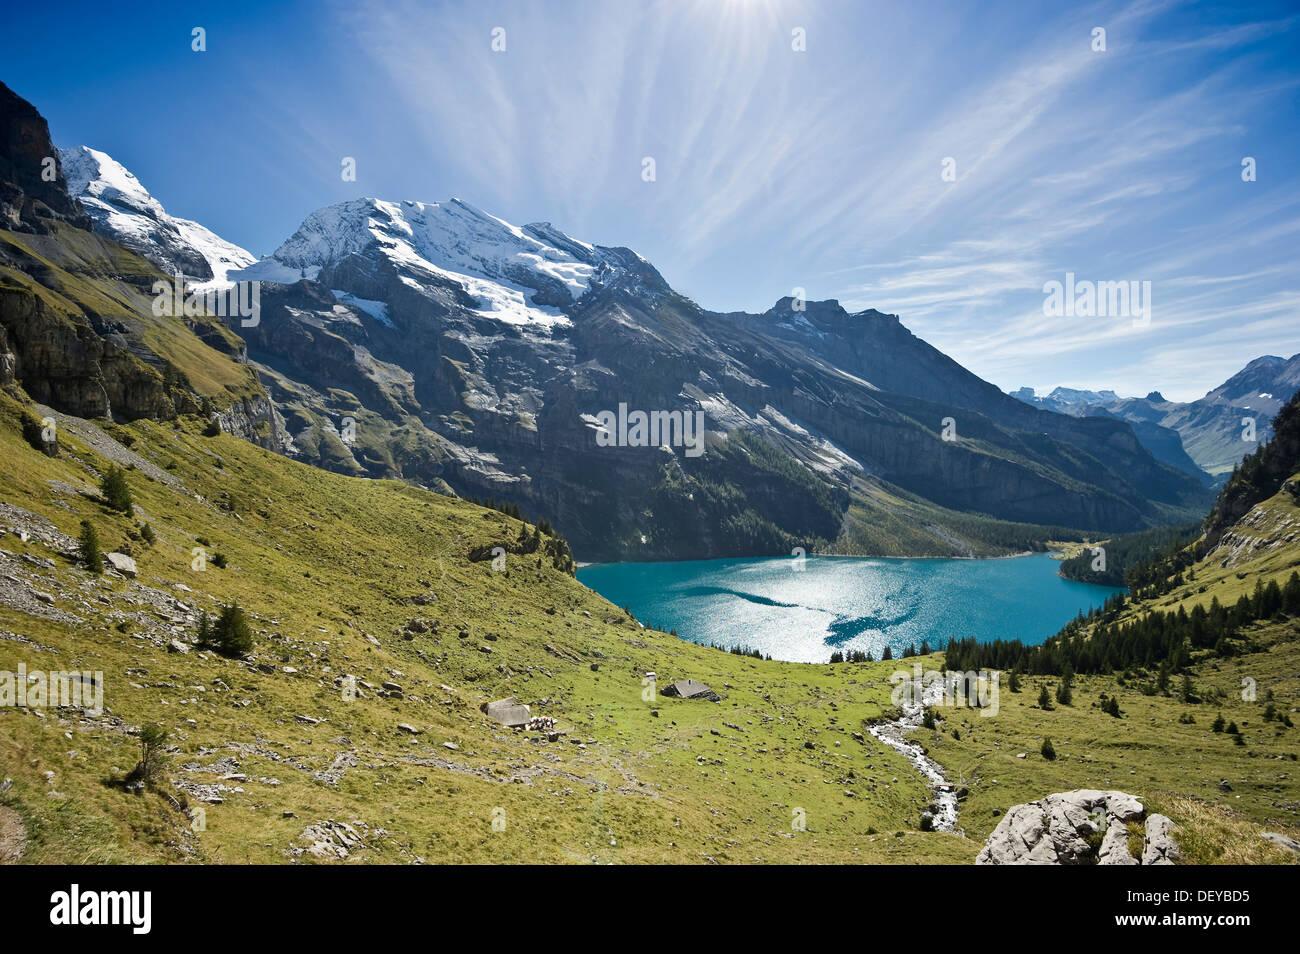 Oeschinensee lake, Kandersteg, Bernese Oberland, Canton of Bern, Switzerland, Europe - Stock Image